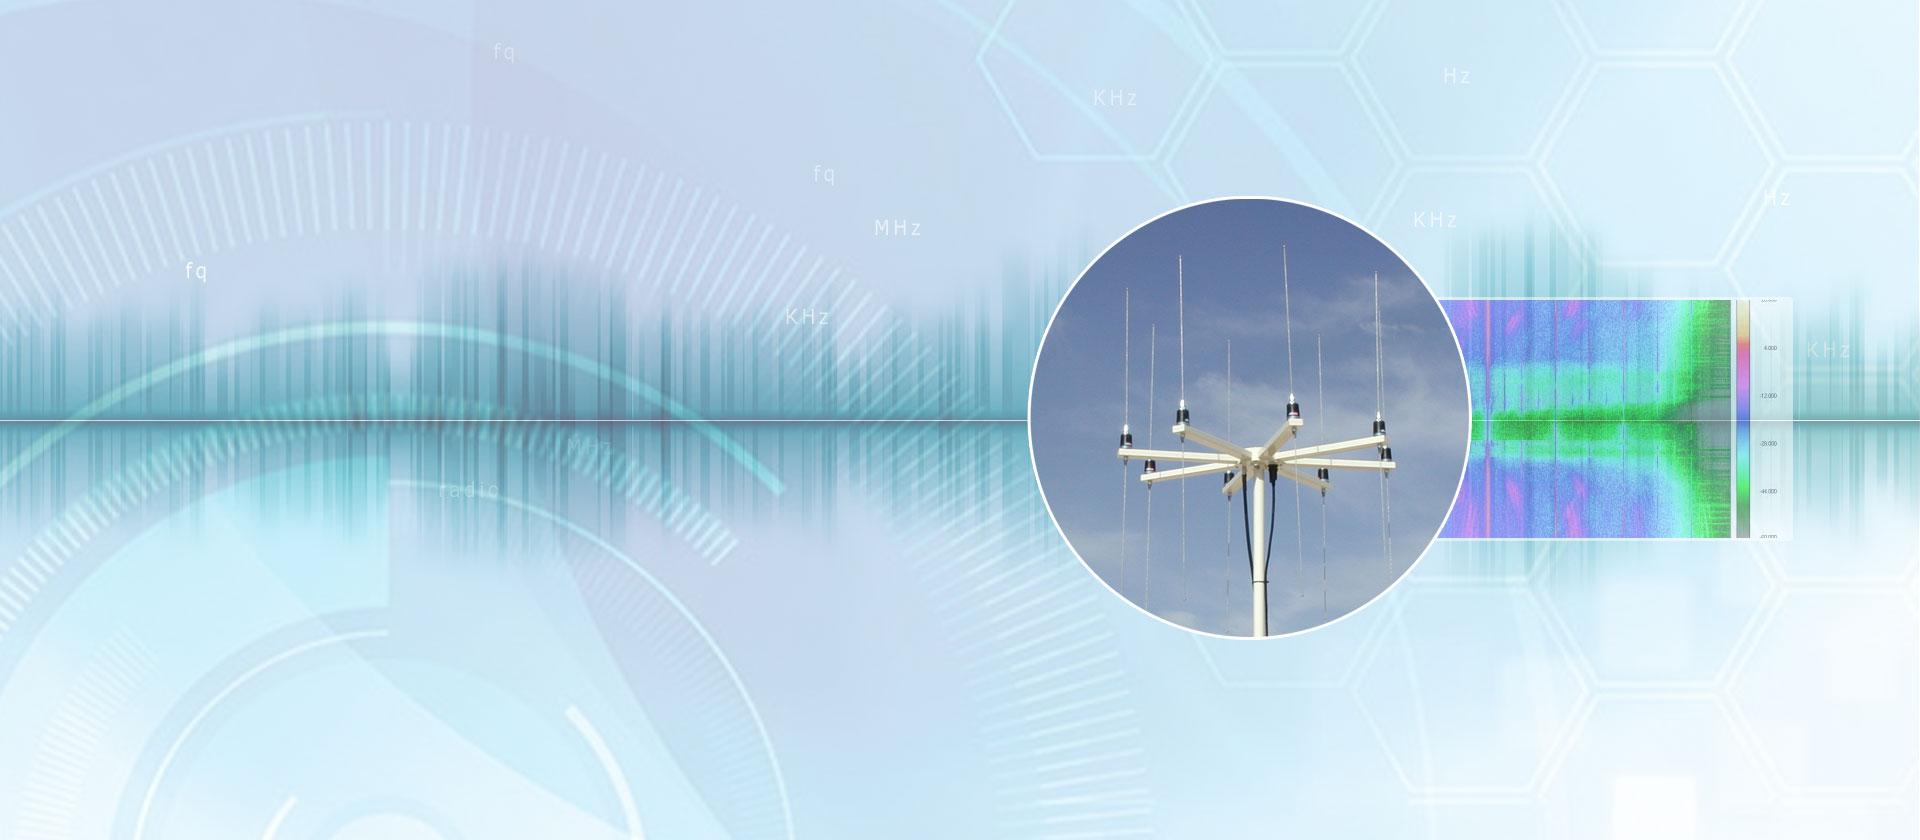 Radio Monitoring and Signal Analysis